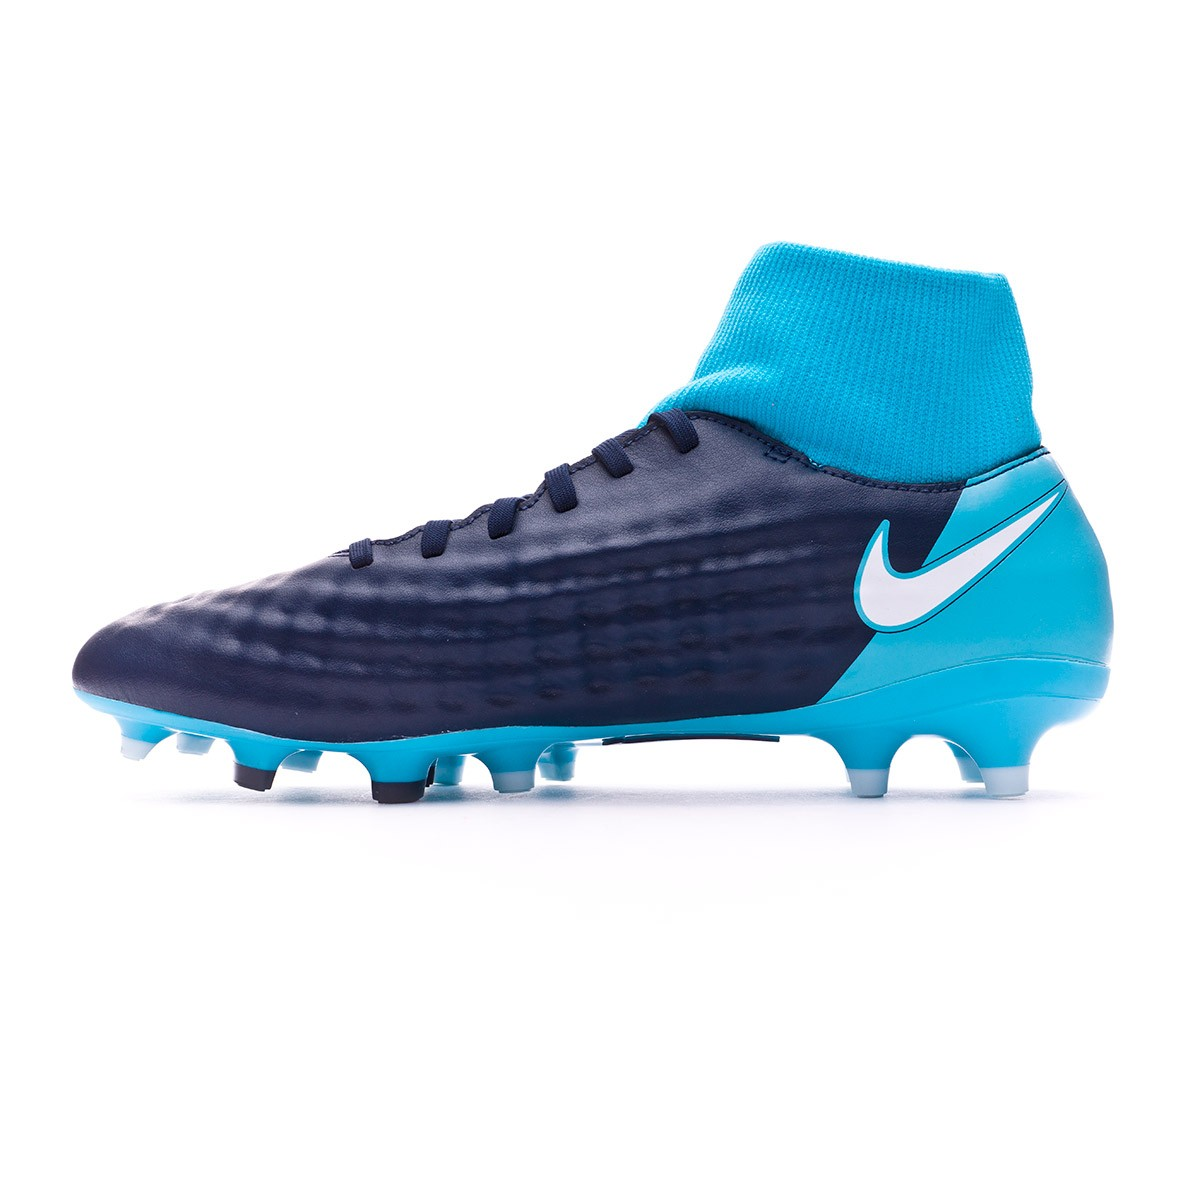 the latest 58c20 b0053 Football Boots Nike Magista Onda II DF FG Glacier blue-Gamma  blue-Obsidian-White - Football store Fútbol Emotion